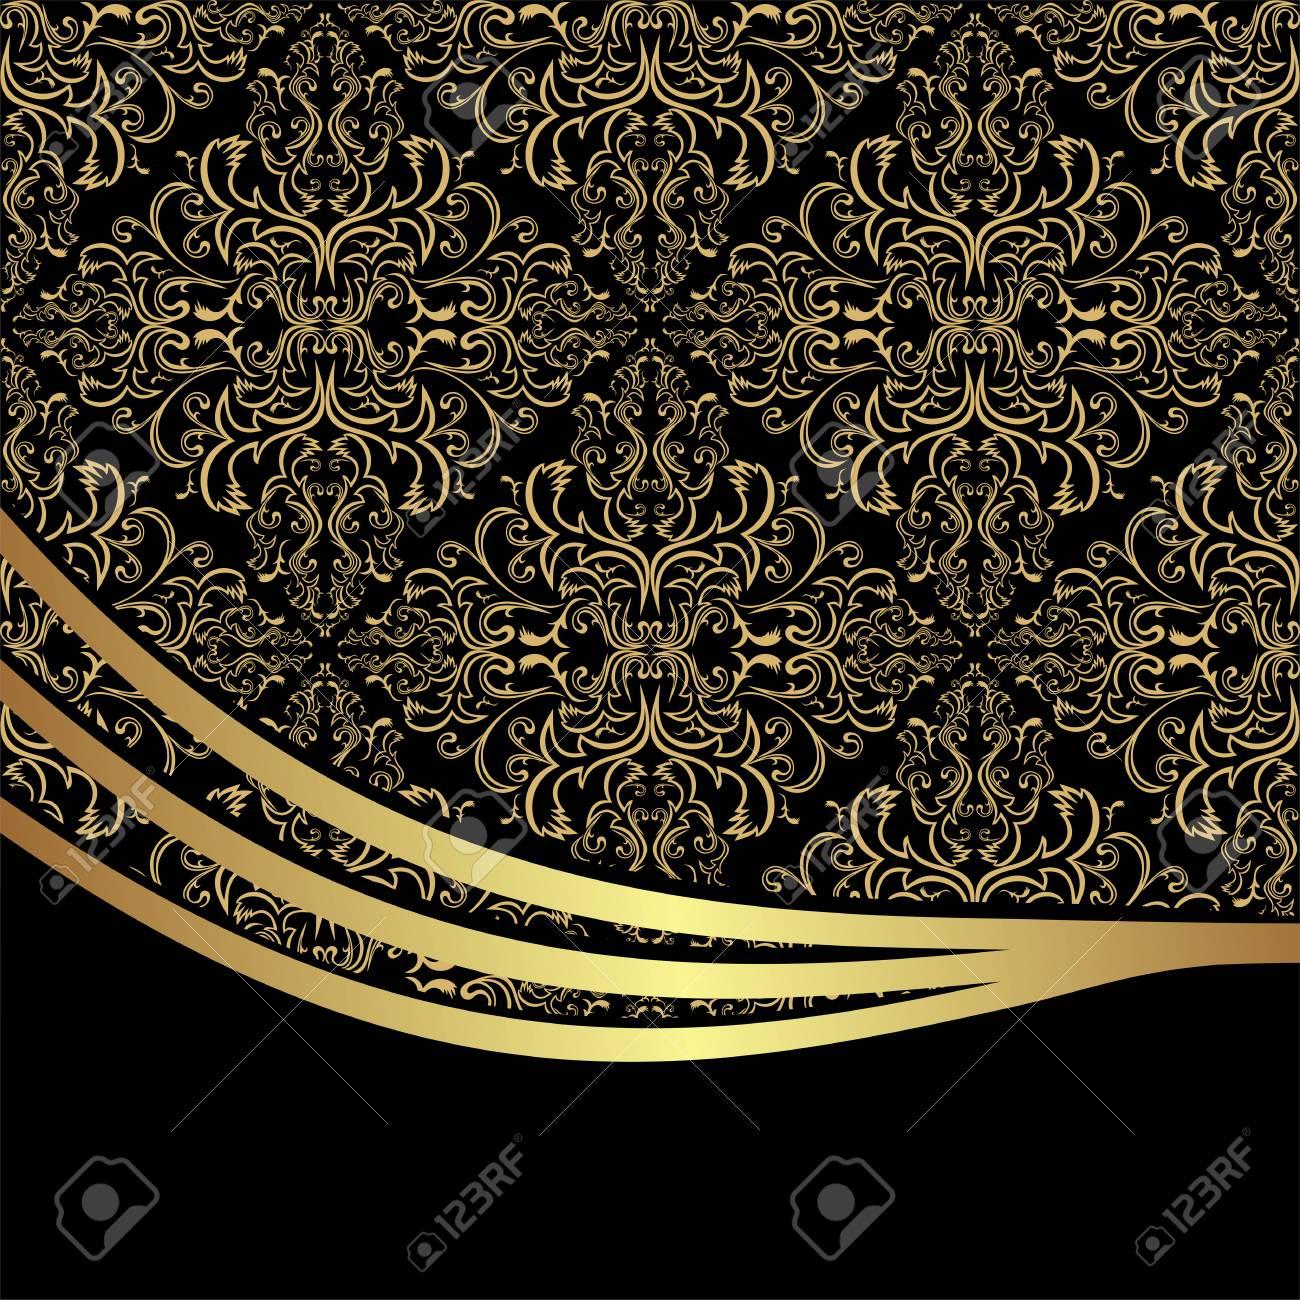 Luxury ornamental Background decorated the elegant Border - 97509762